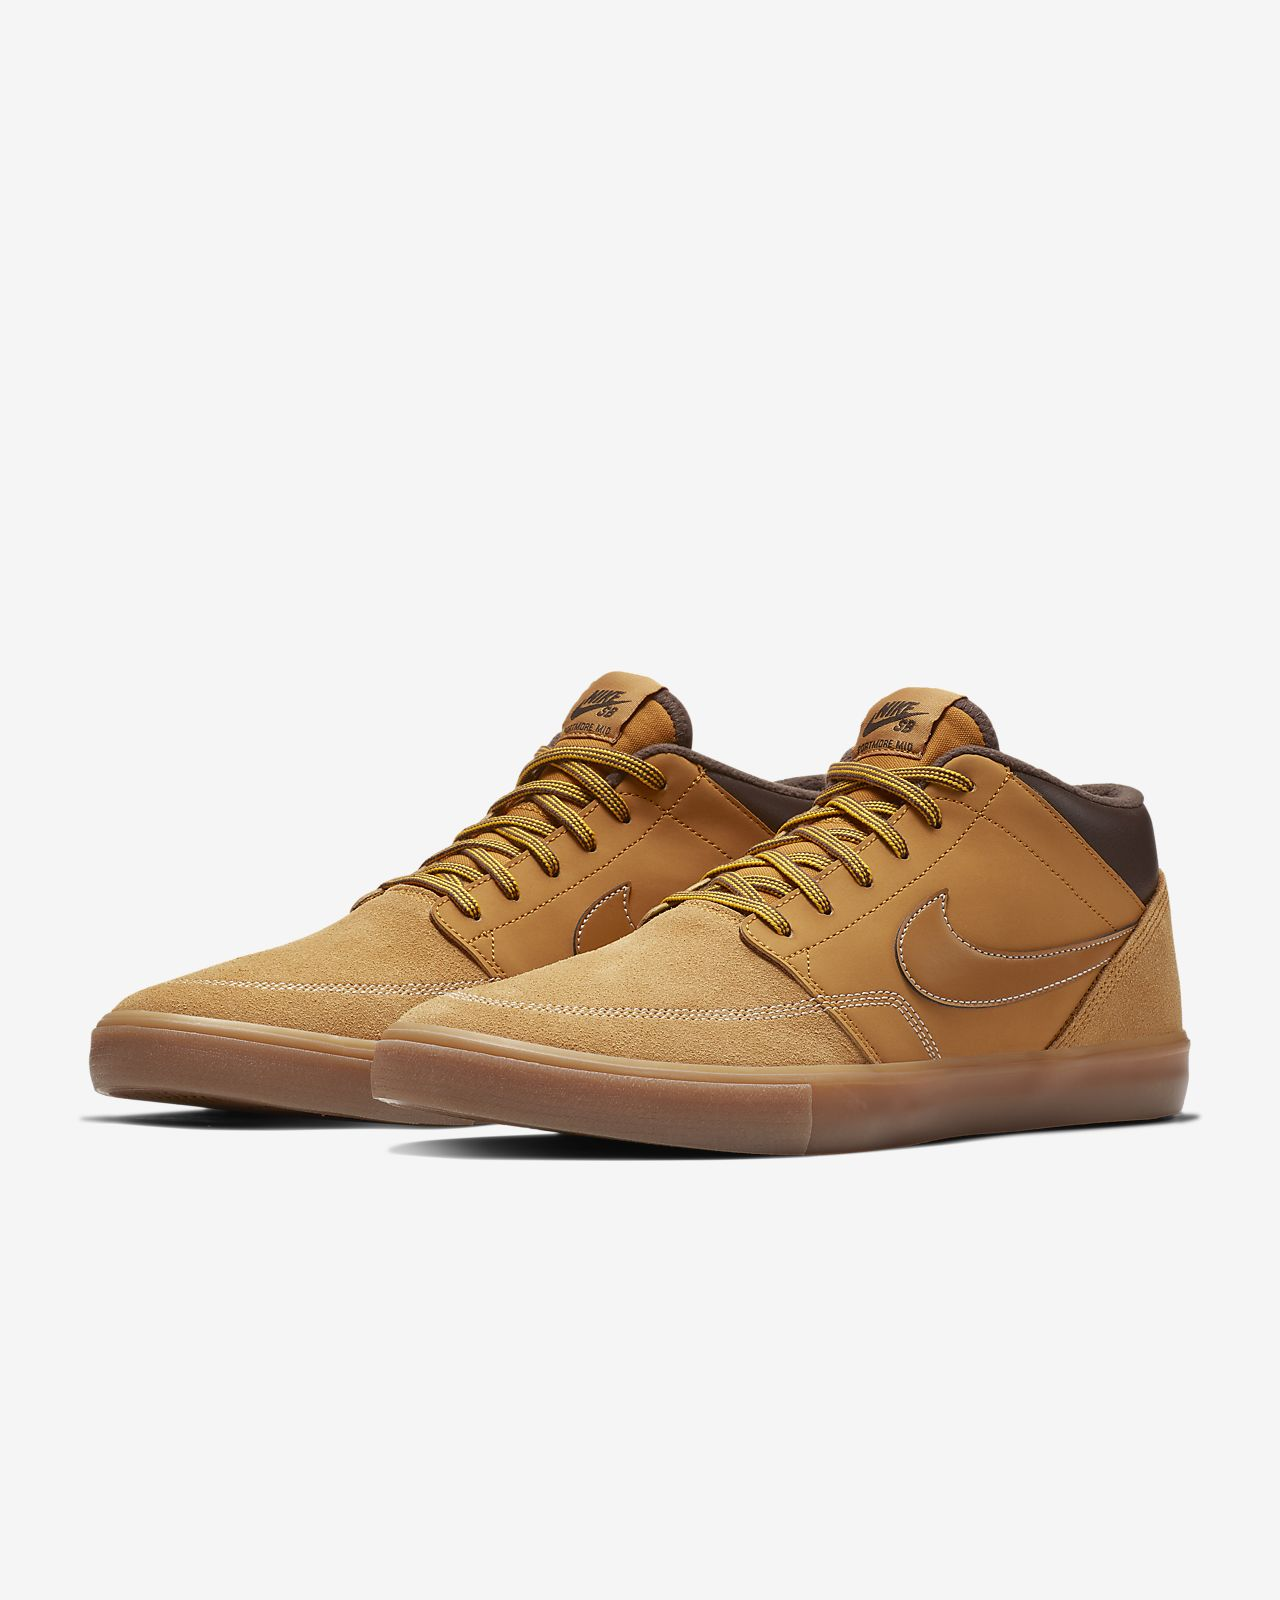 new product 80792 9490e ... Nike SB Portmore II Solarsoft Mid Bota Skateboarding Shoe